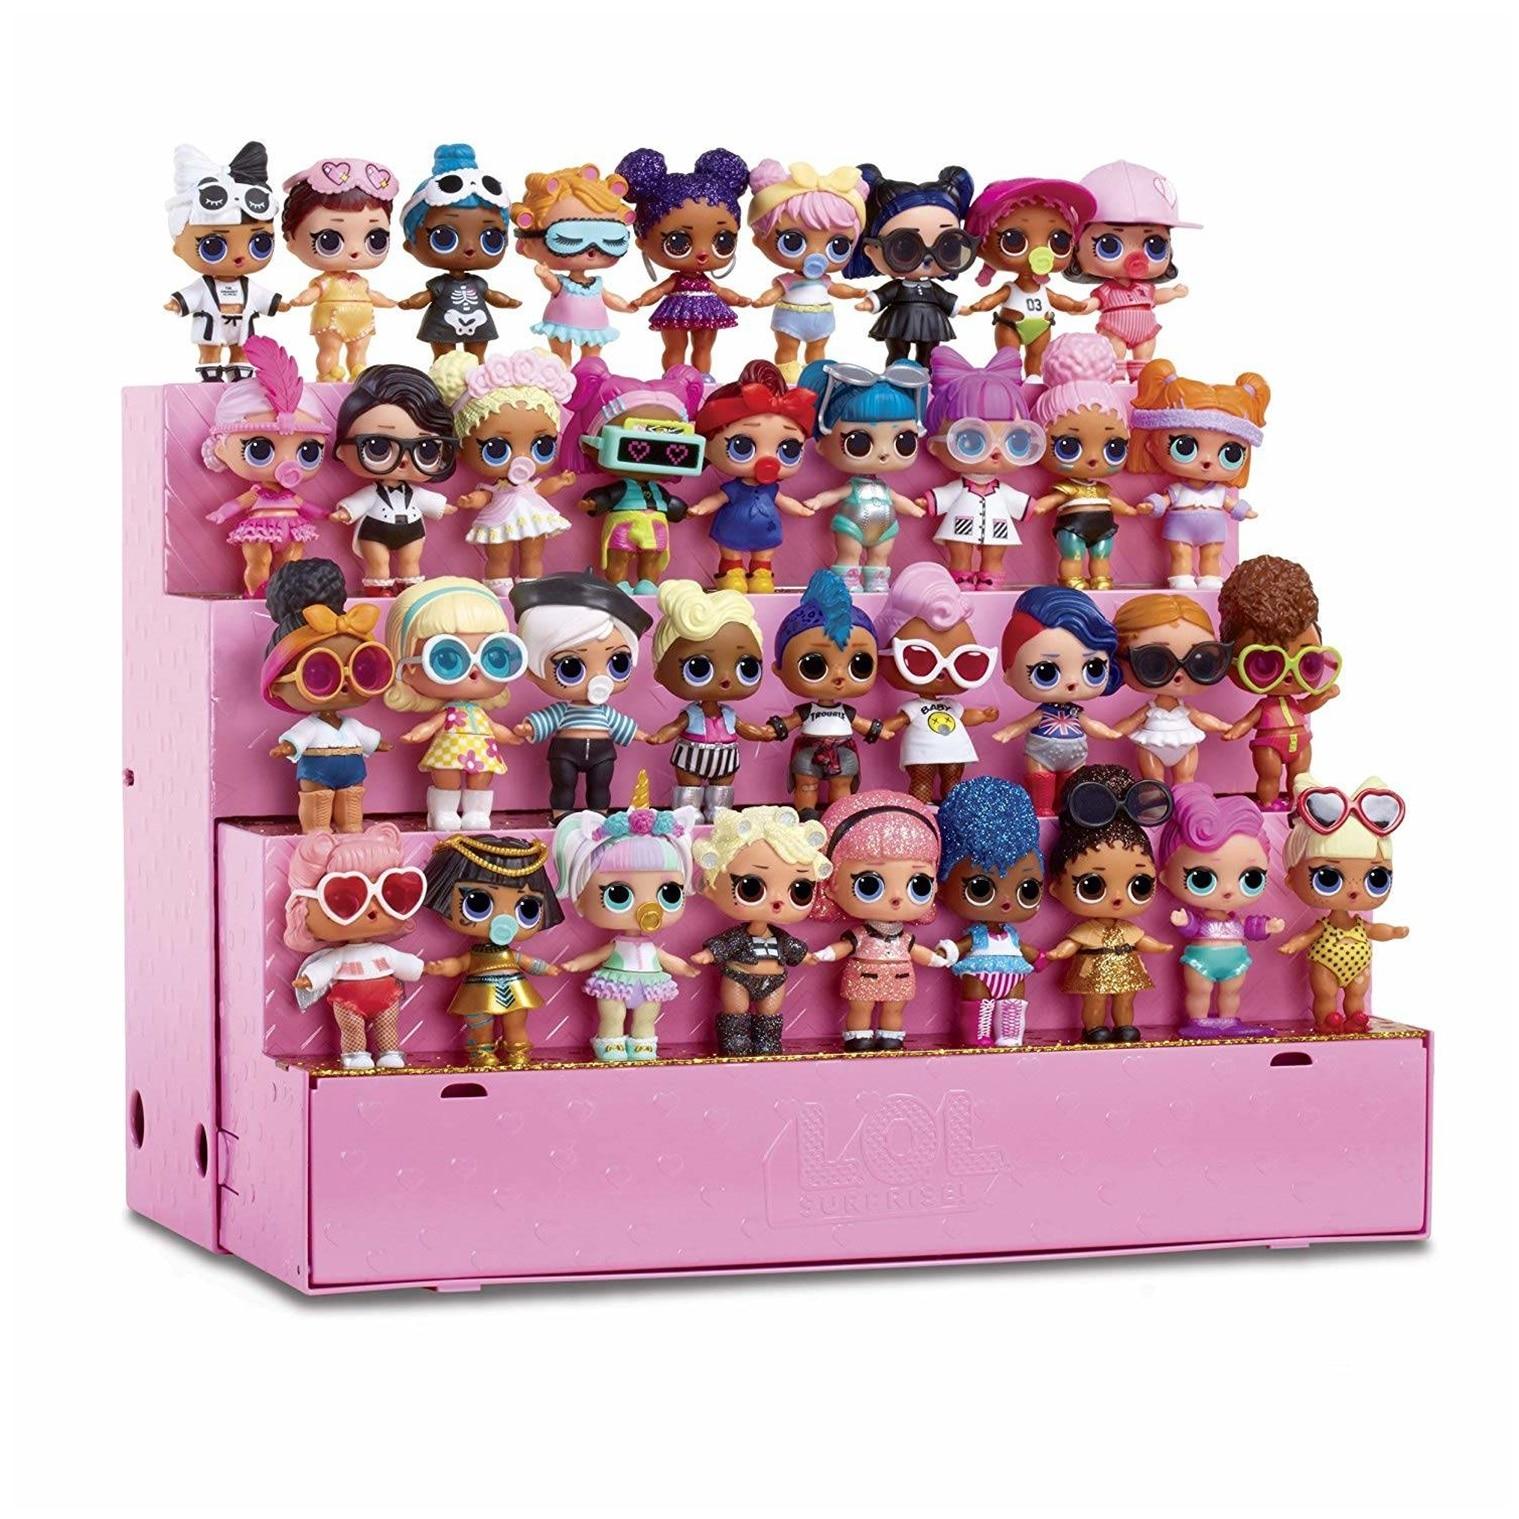 LOL Dolls SURPIRSE Without Original Box Magic DIY Random Lols Dolls Action Figure Model Girl's Toy Gift